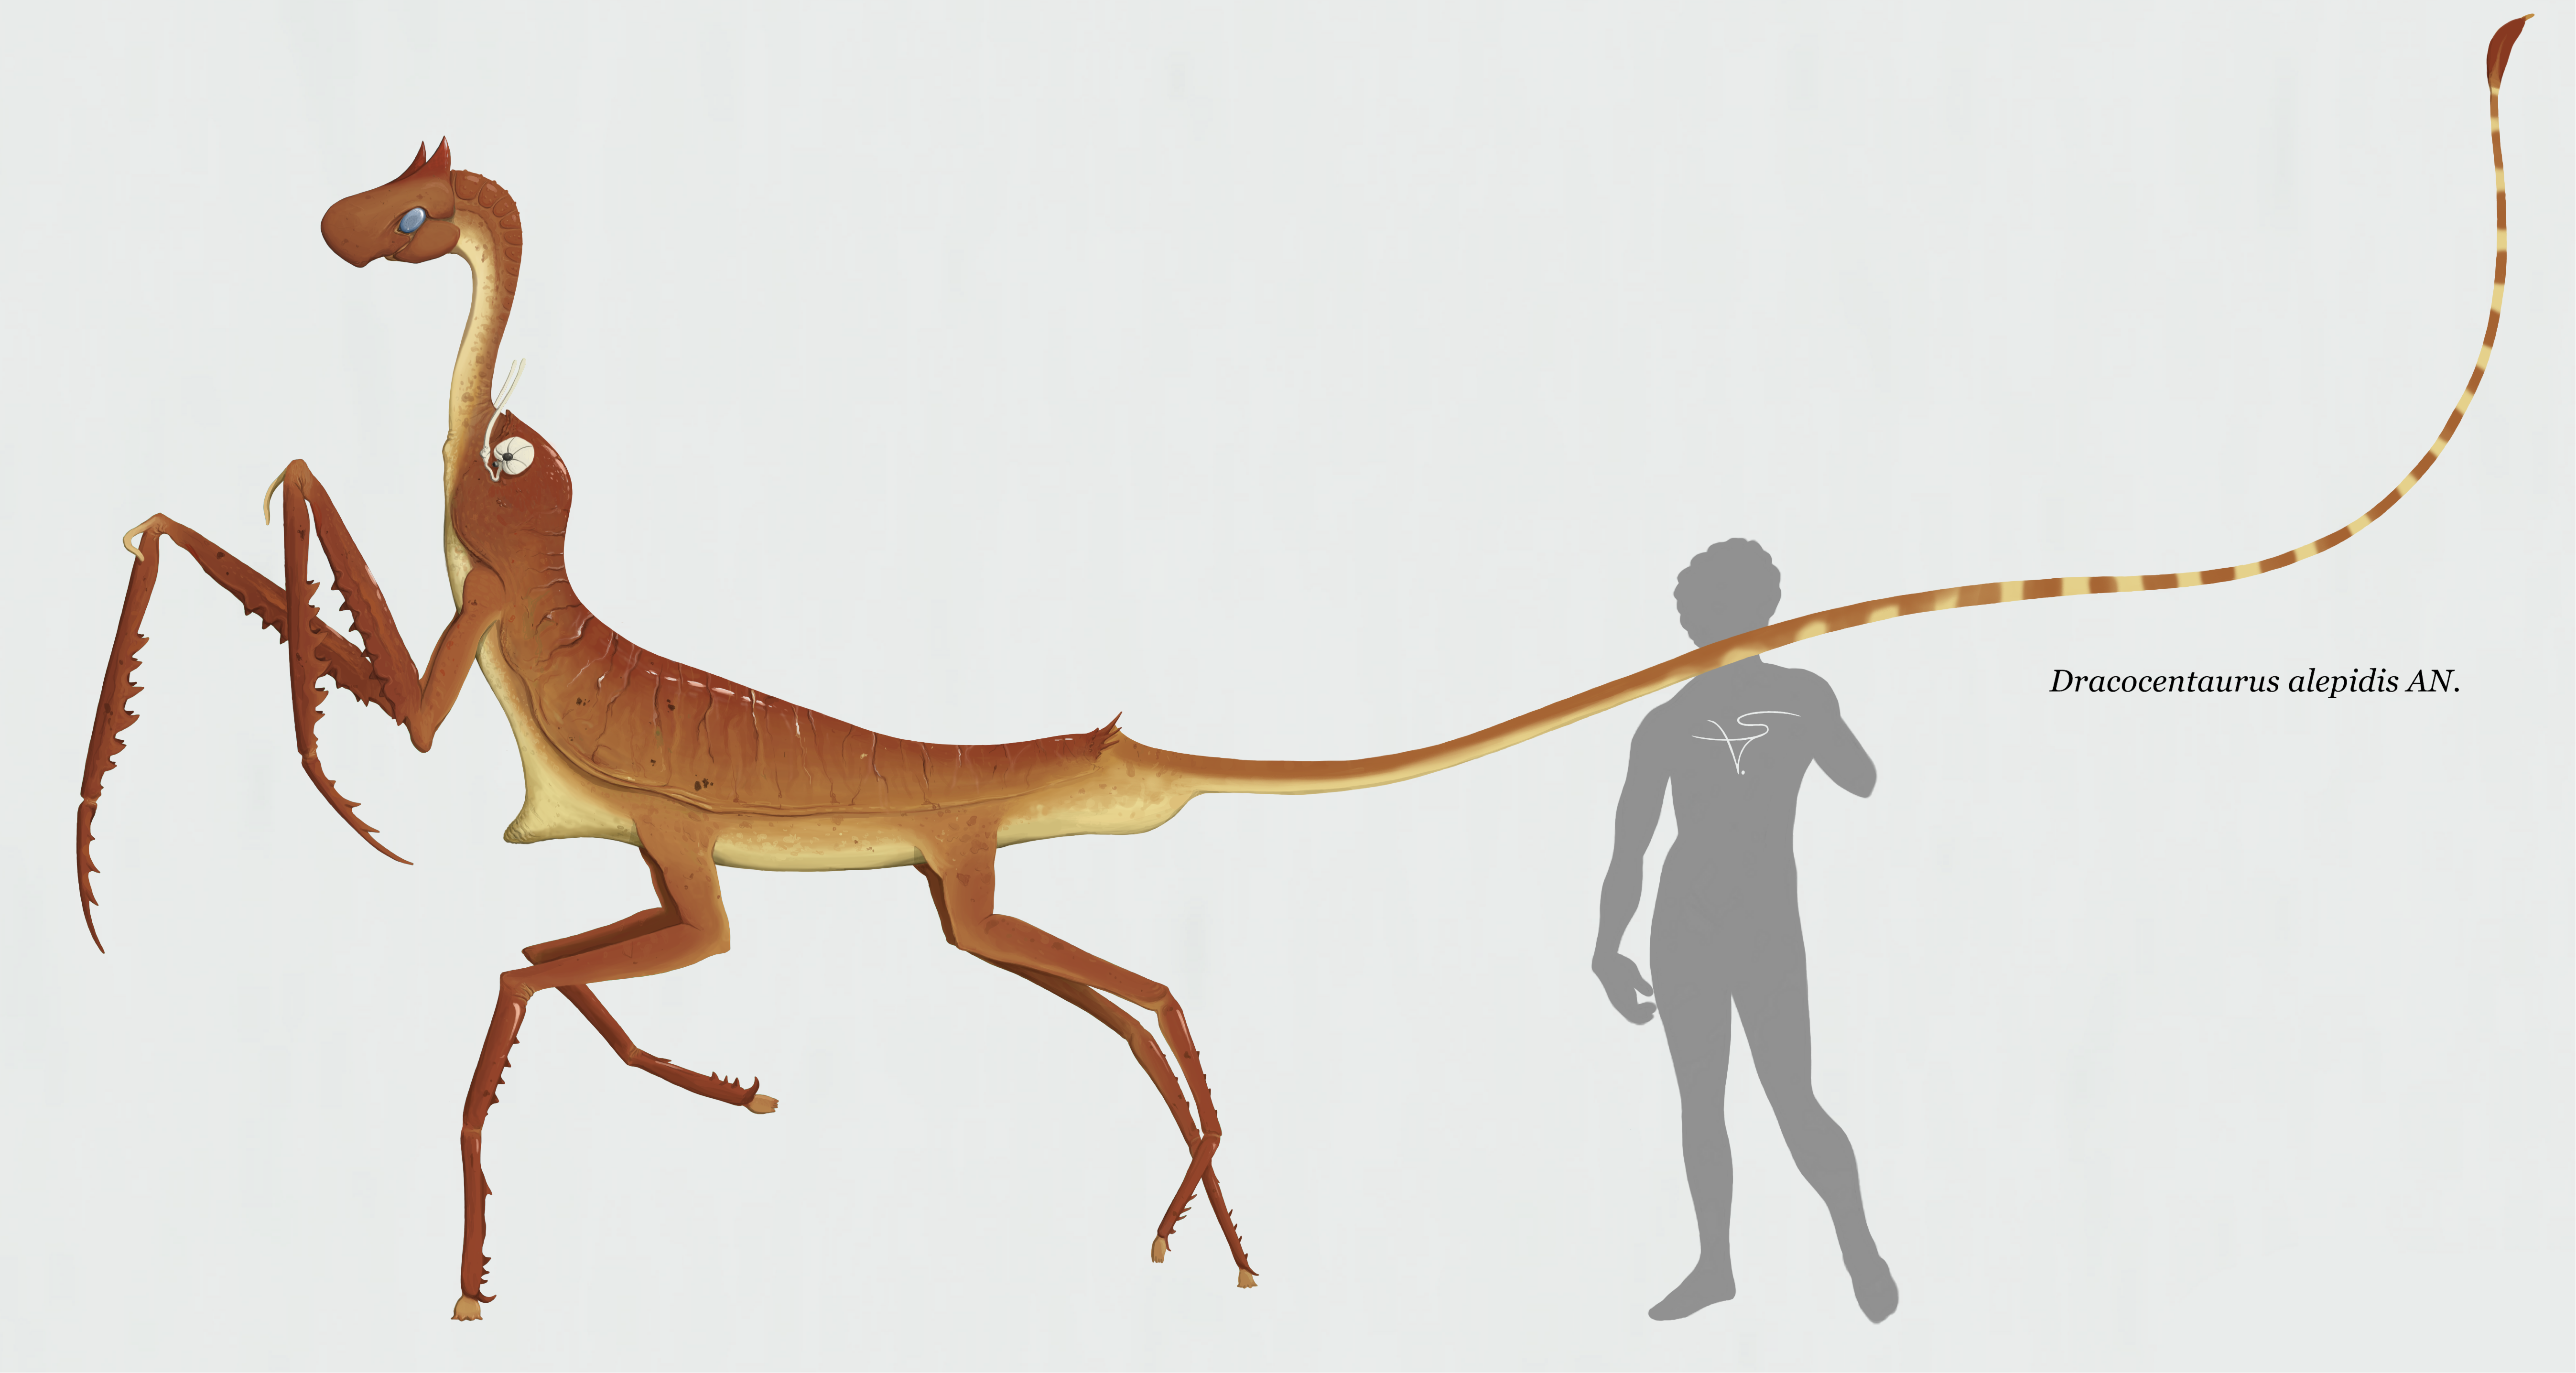 Dracocentaurus alepidis by Sanrou